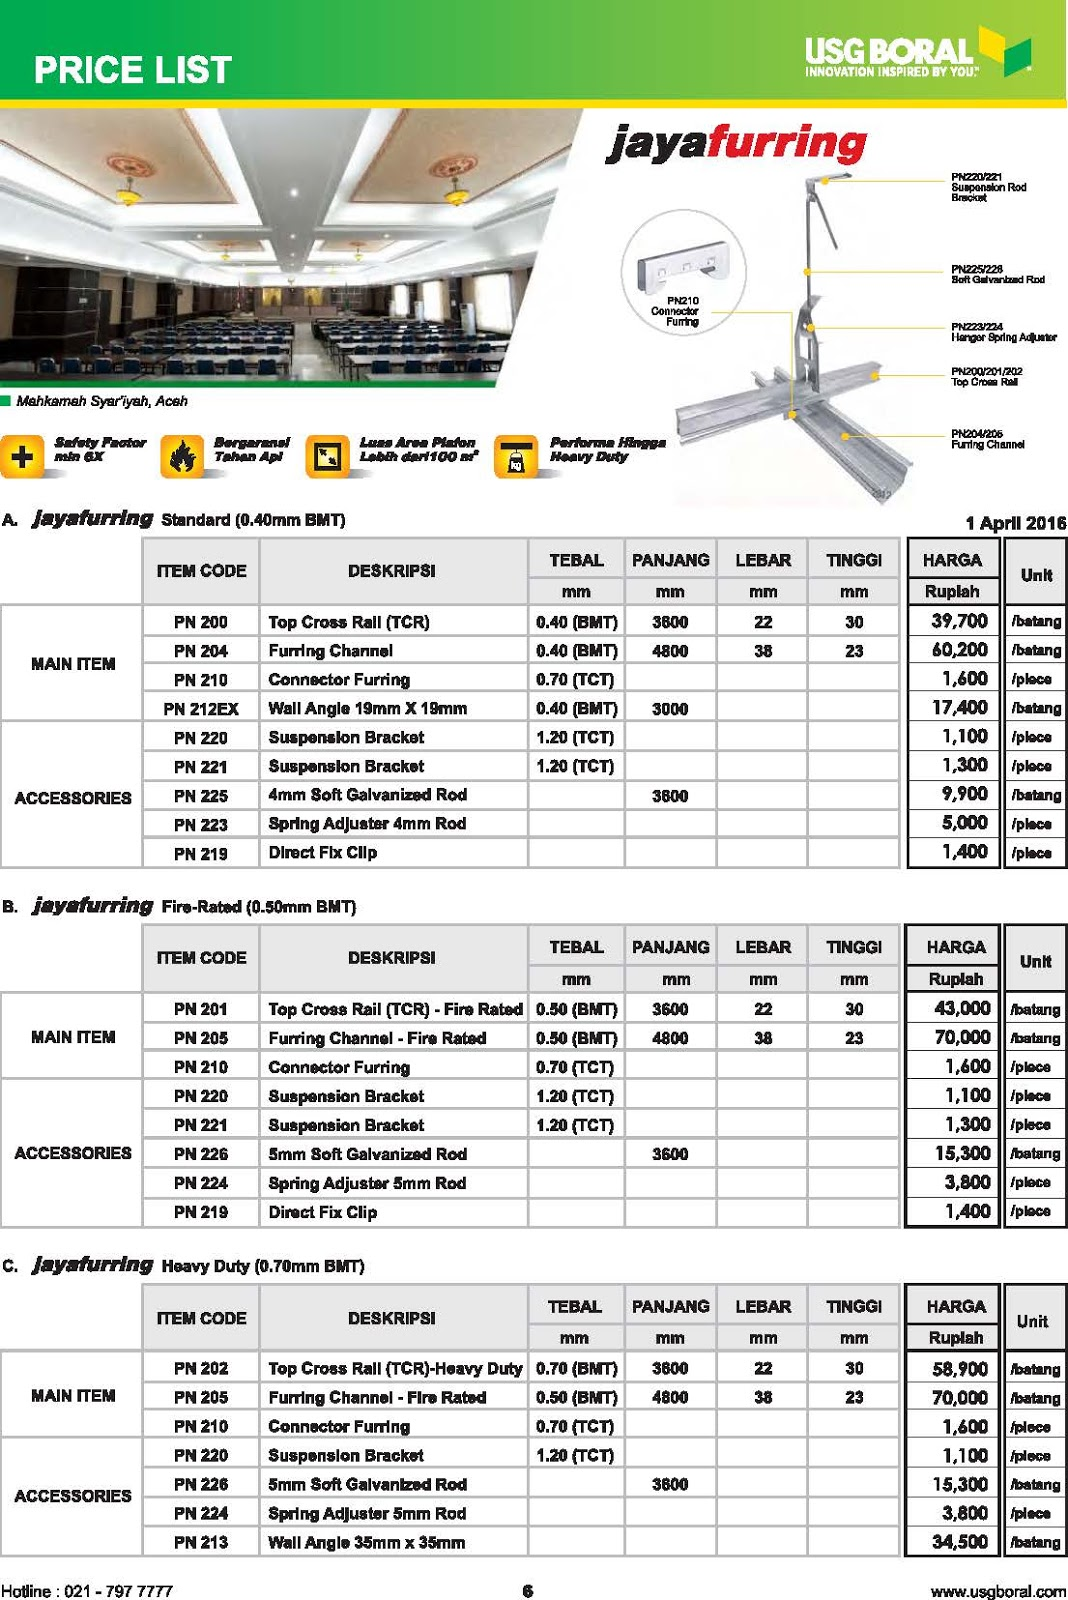 Daftar Harga Gypsum Jayaboard dan Accessories di Malang